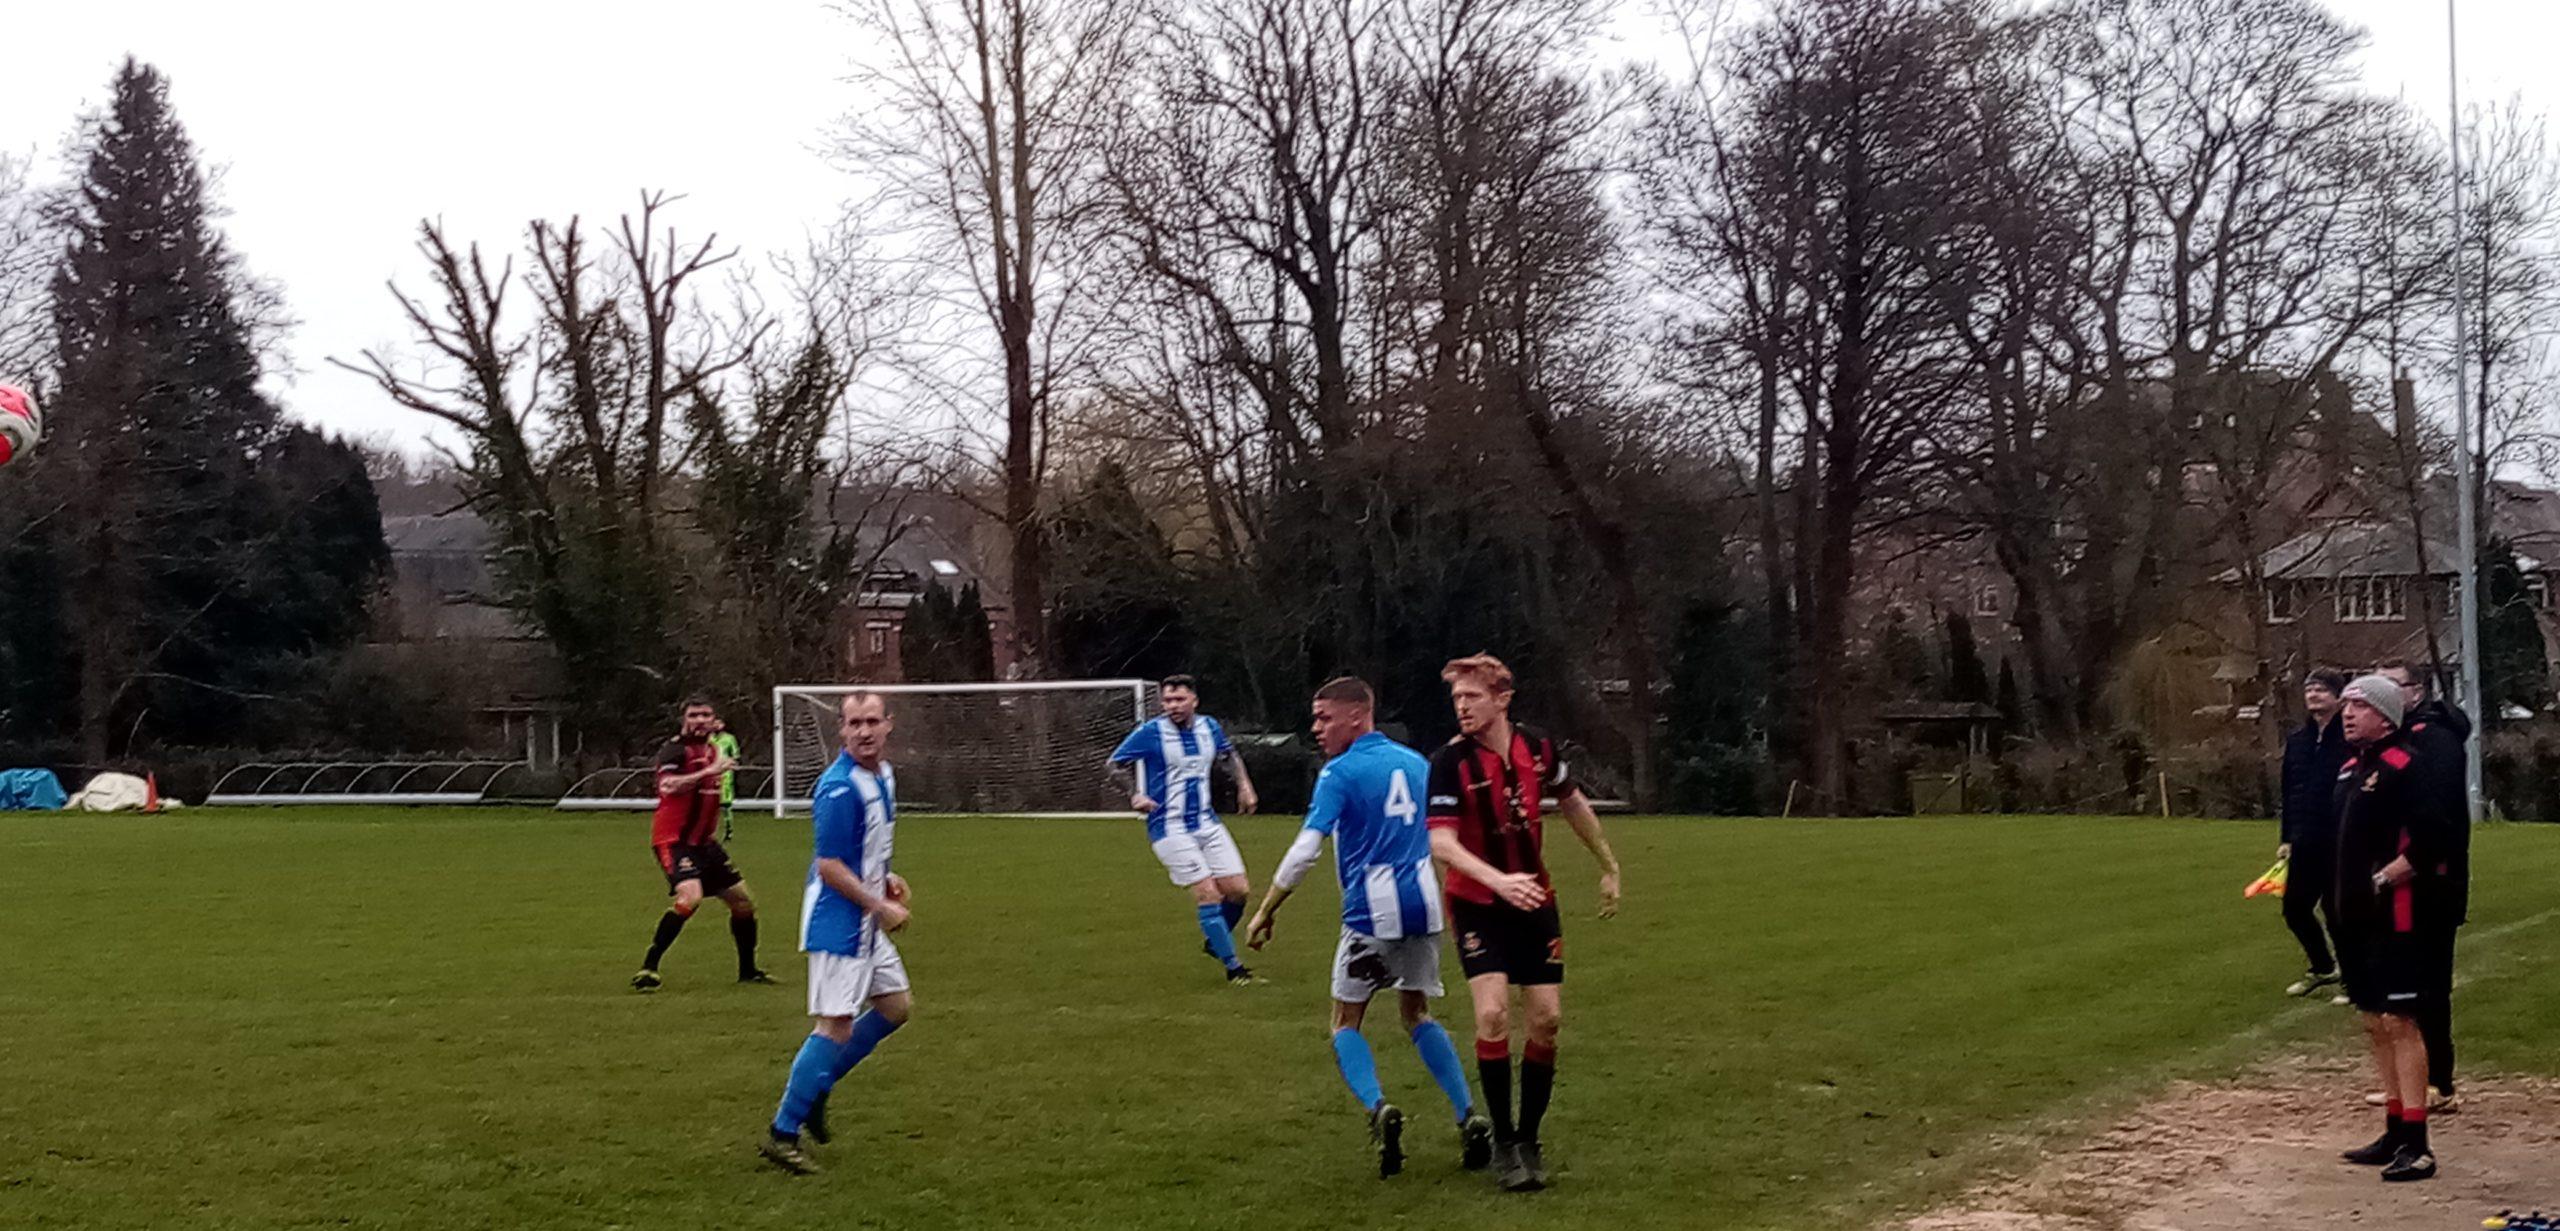 Overton United 2-2 Fleetlands